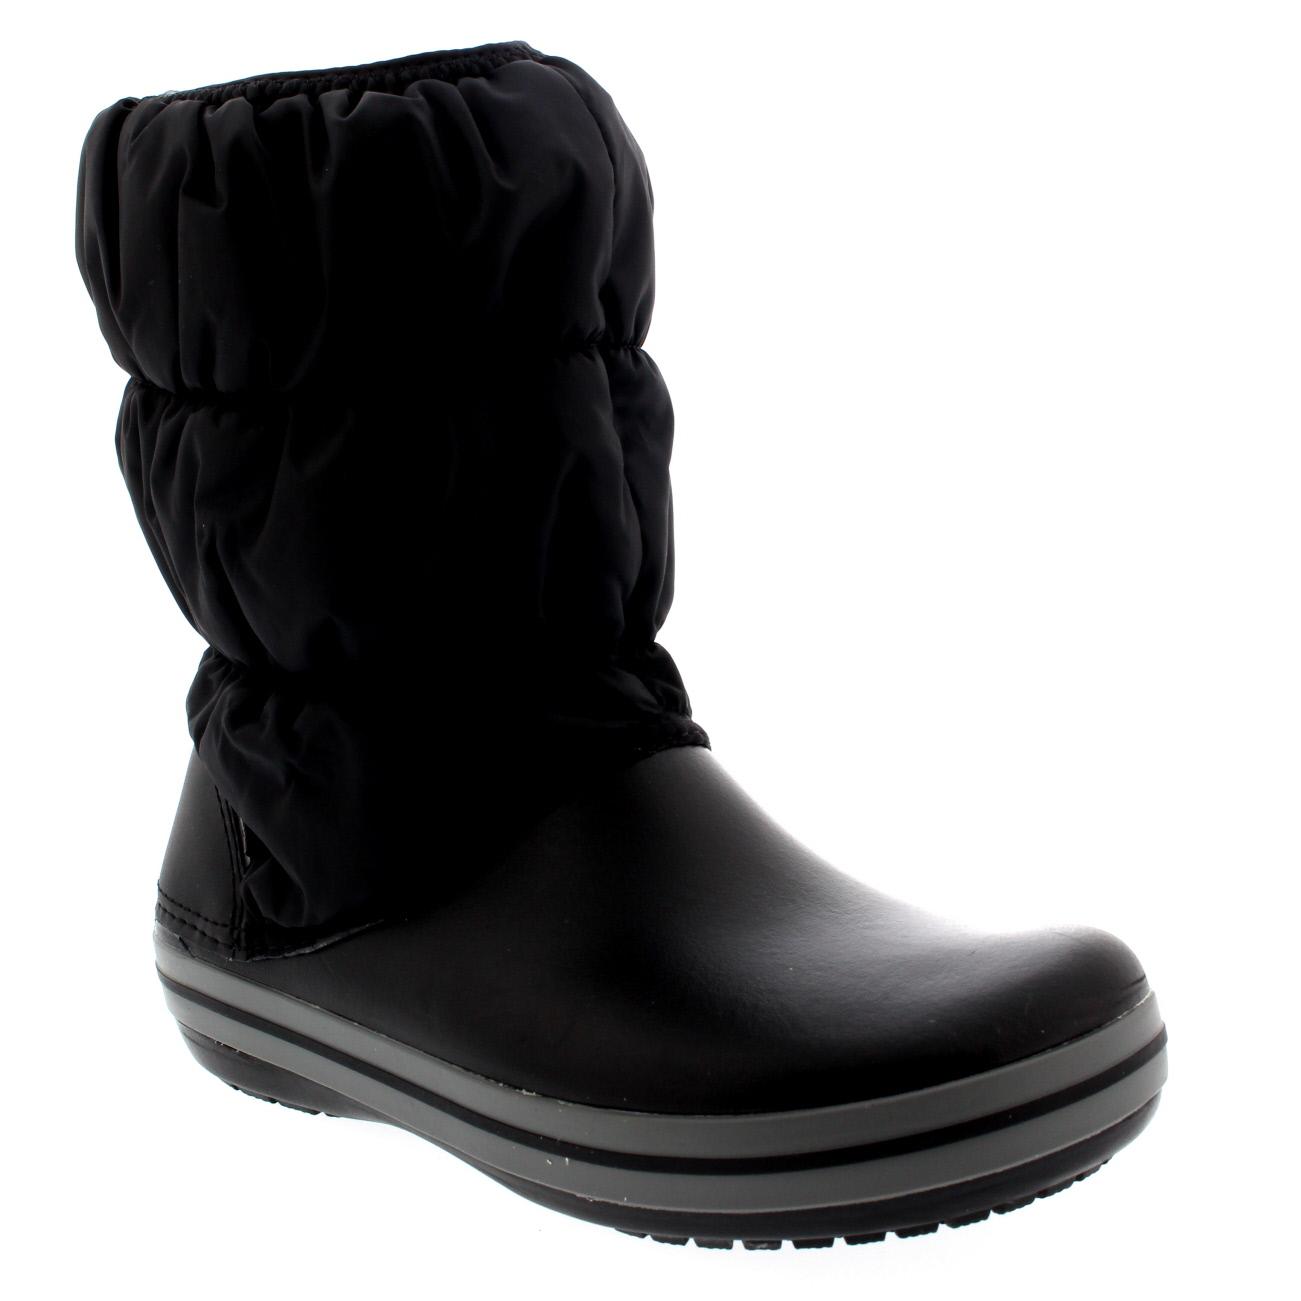 Crocs Winter Puff Boots